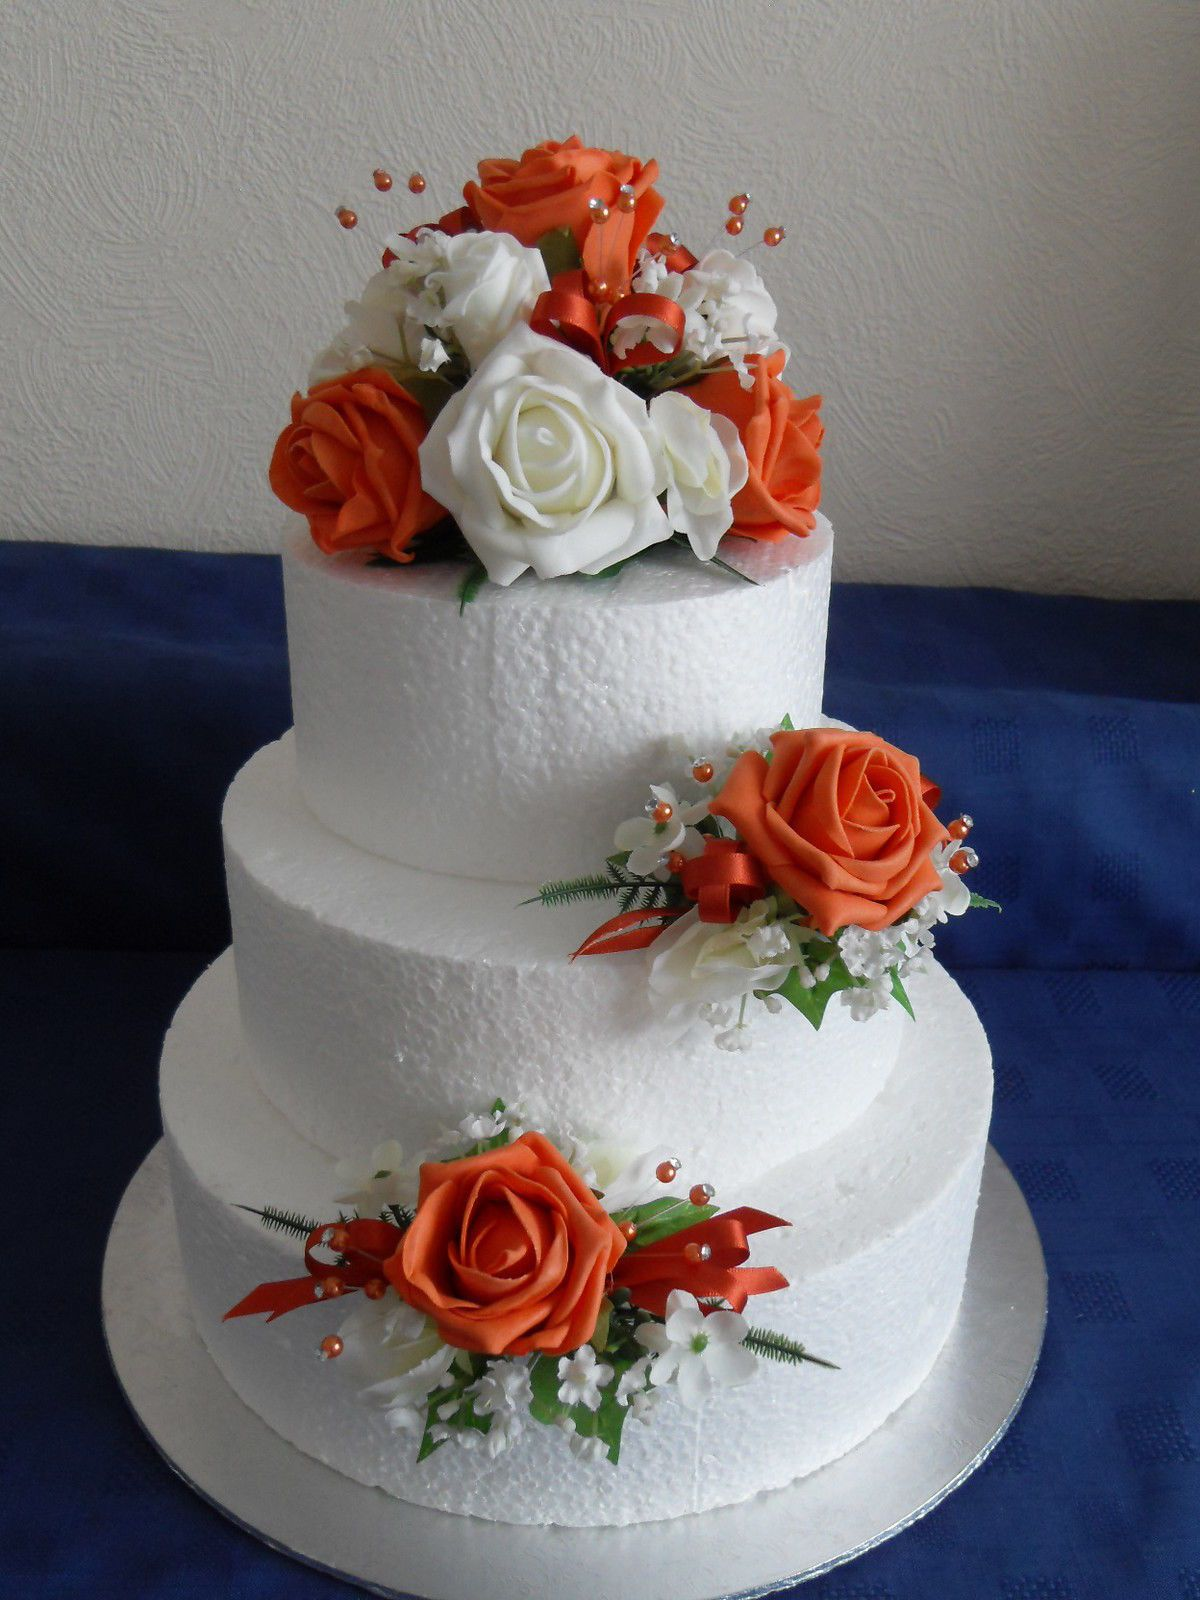 3 Artificial Silk Flower Wedding Cake Toppers In Orange Ivory